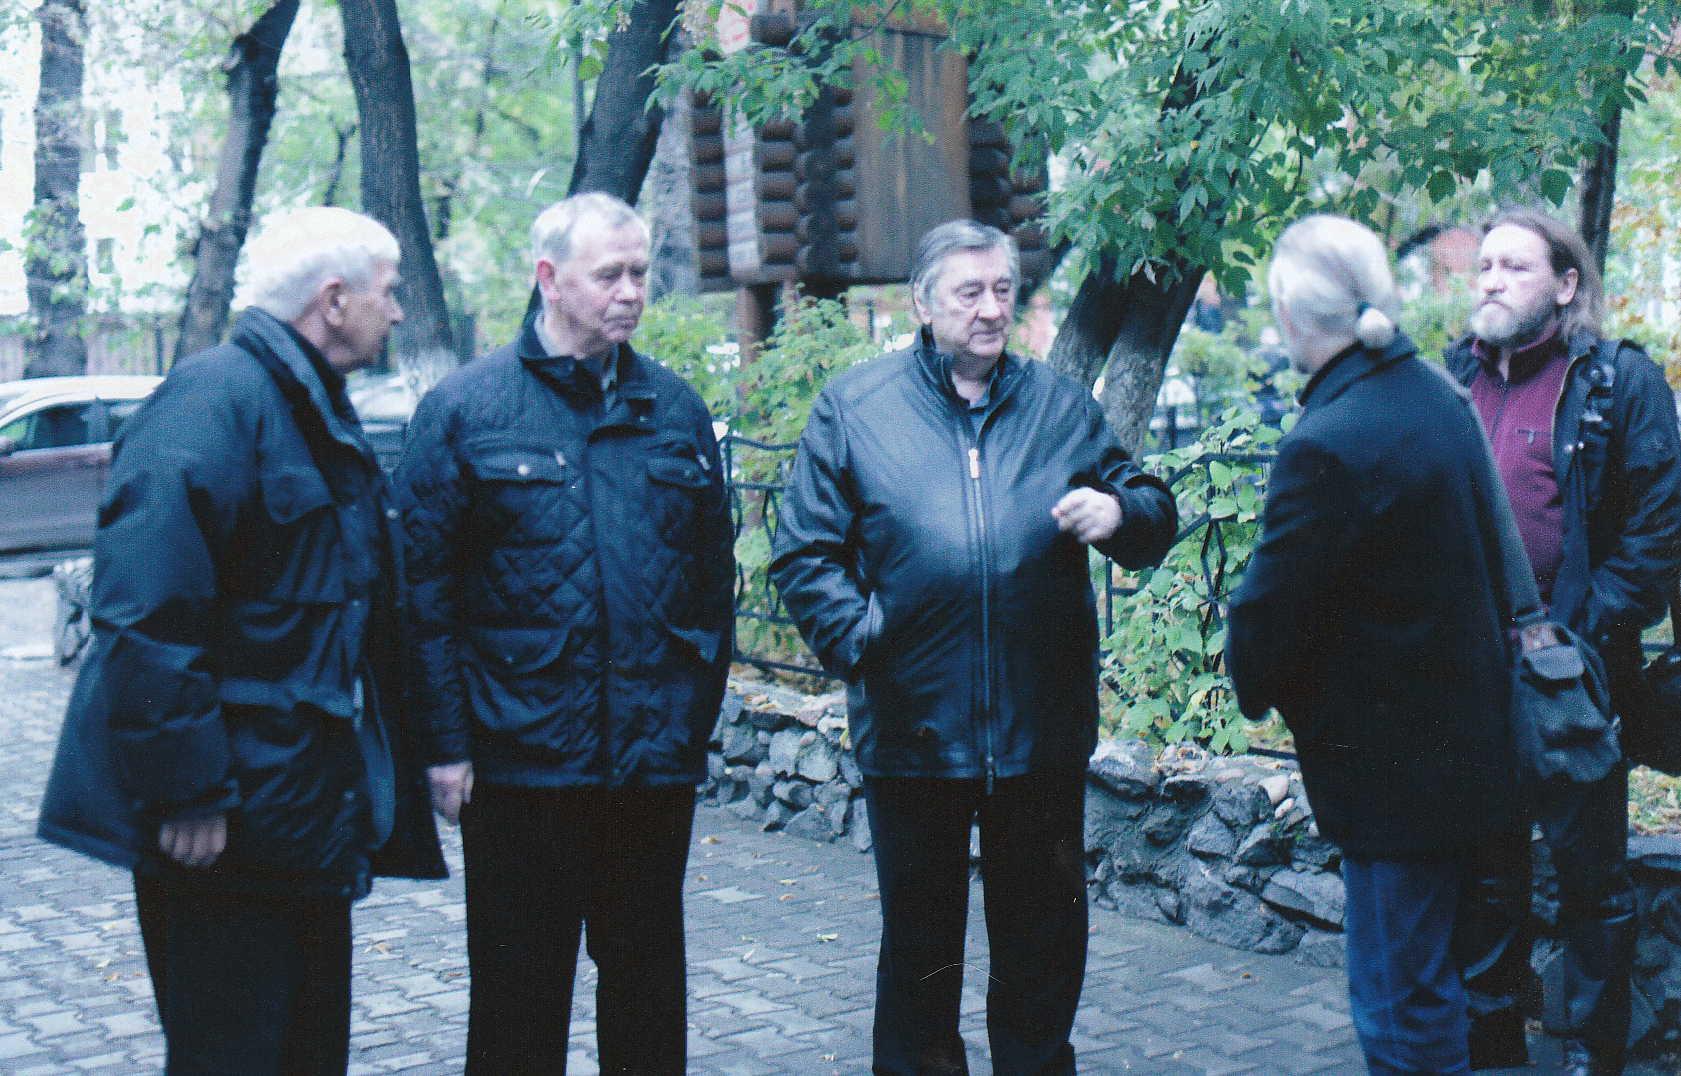 Слева направо - Эдуард Анашкин - Валентин Распутин - Алексанлр Проханов - Иркутск - праздник Сияние России 2013